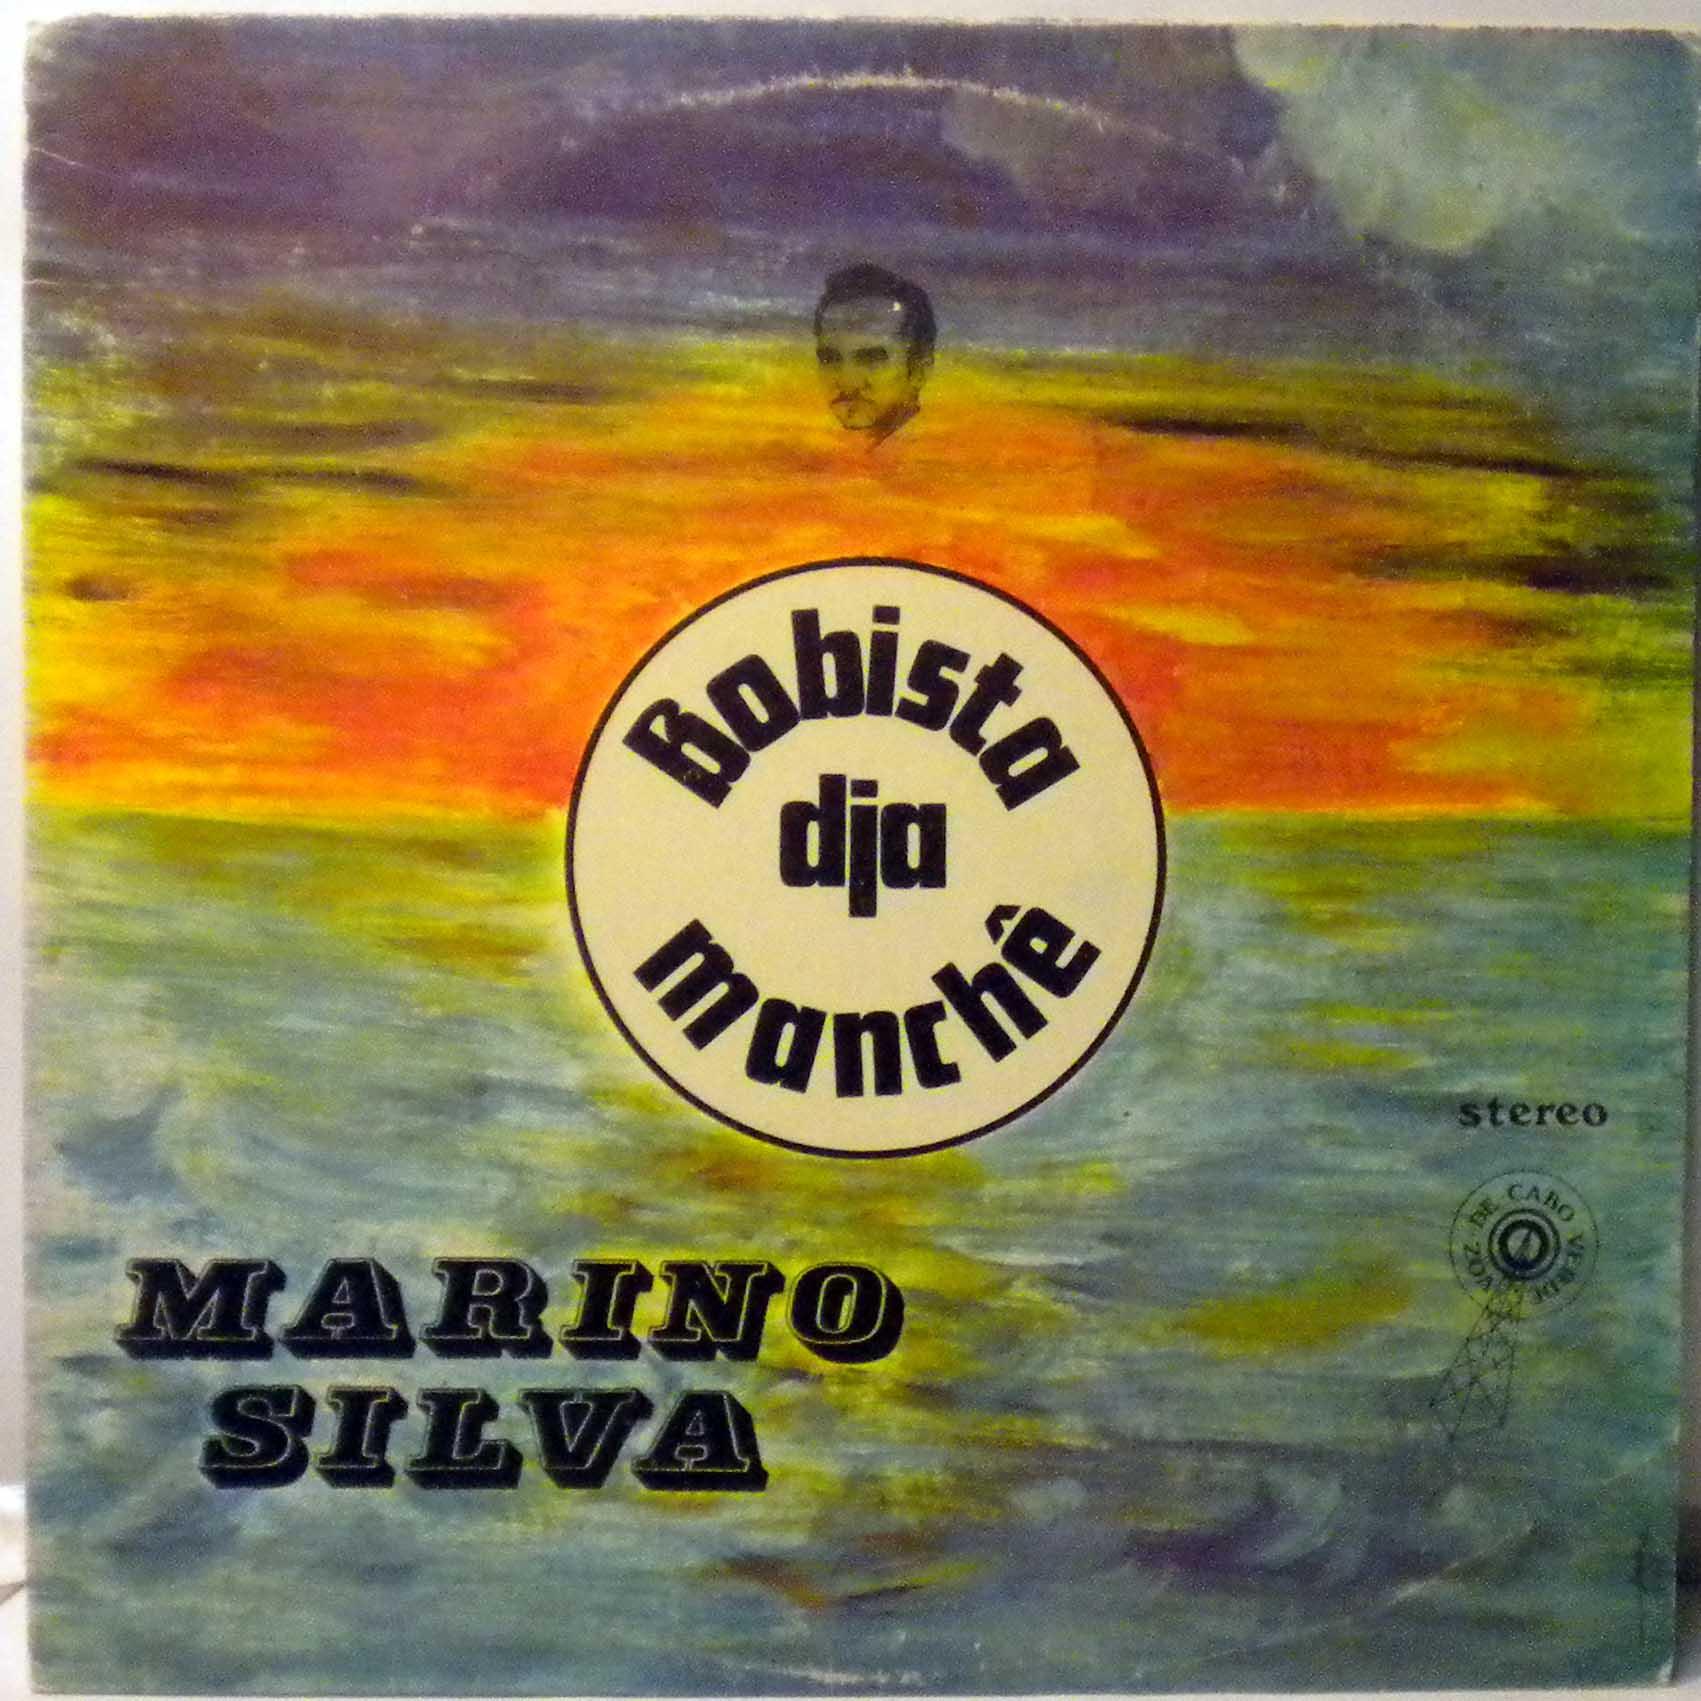 MARINO SILVA - Bobista dja manche - LP